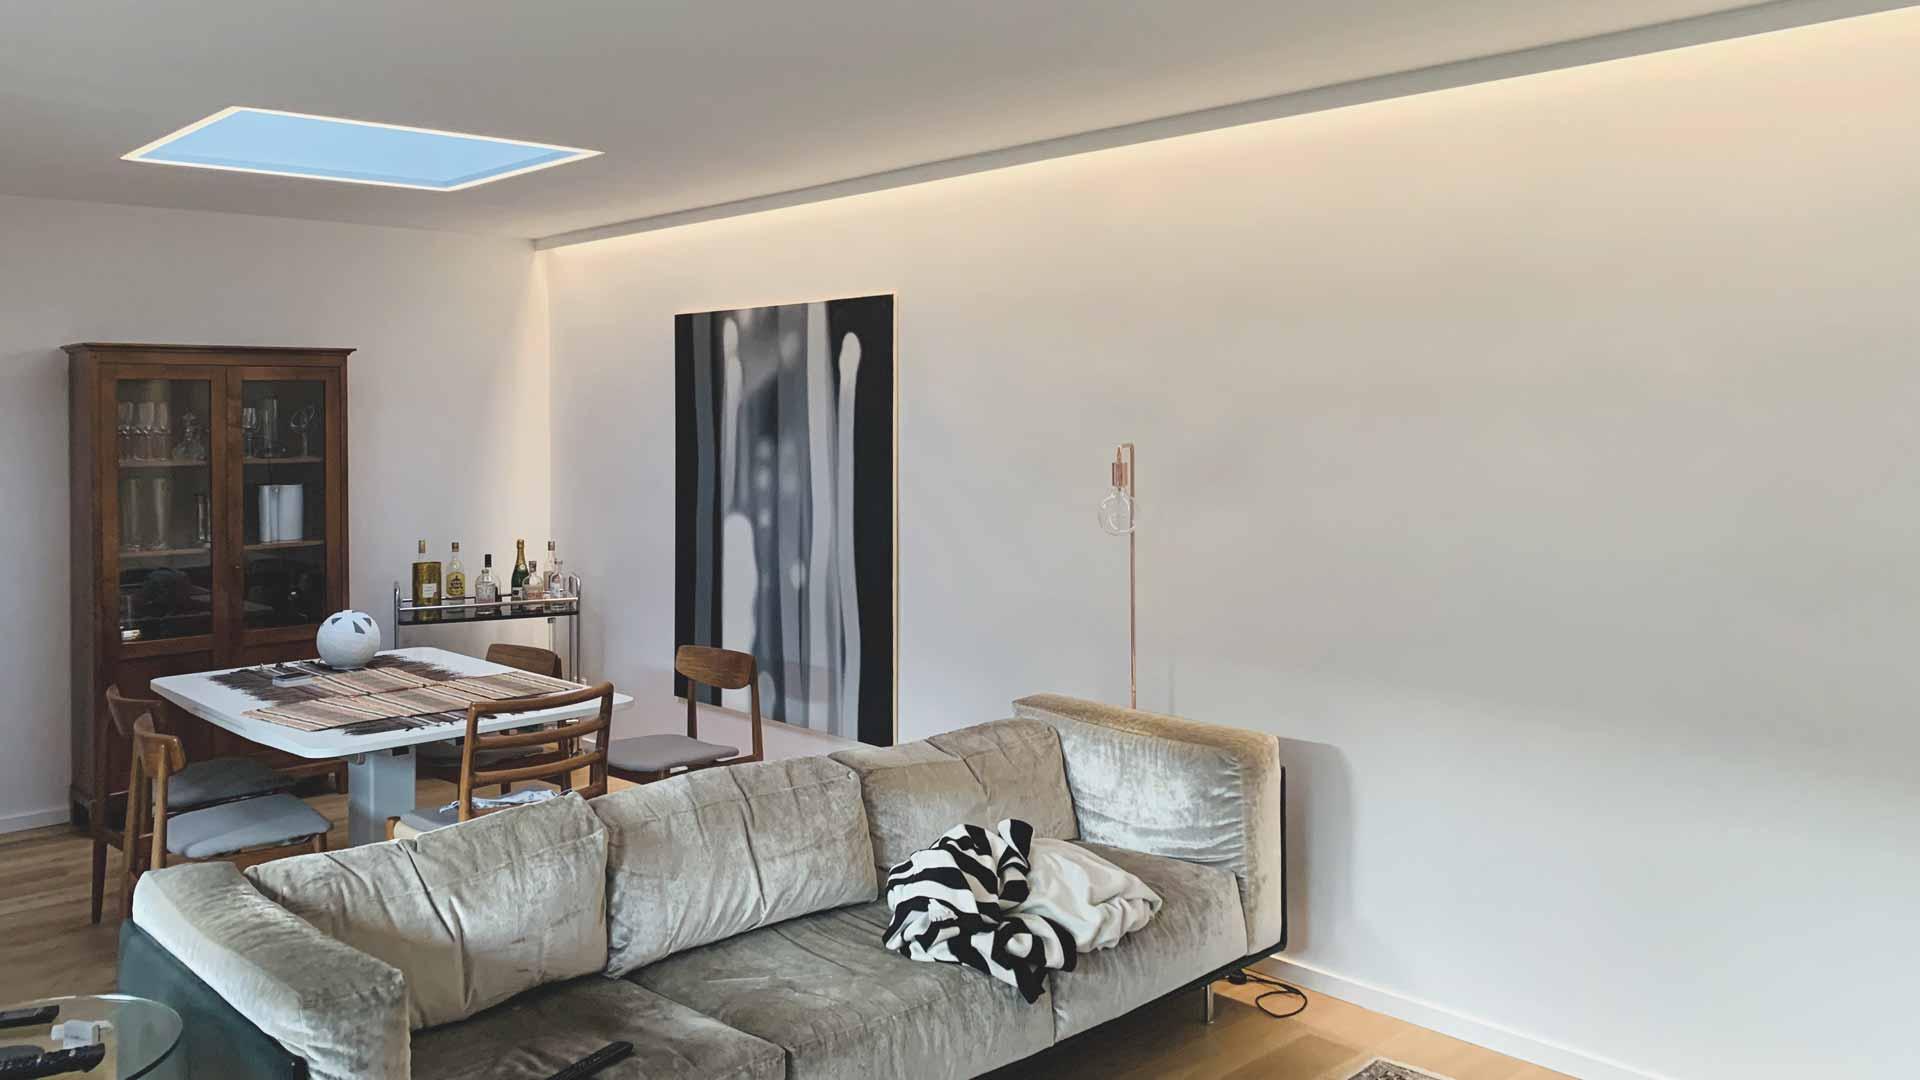 MAASS-Lichtplanung_Beleuchtung eines Einfamilienhaus__191007-MAASS-Licht_EFH_Wohnzimmer2